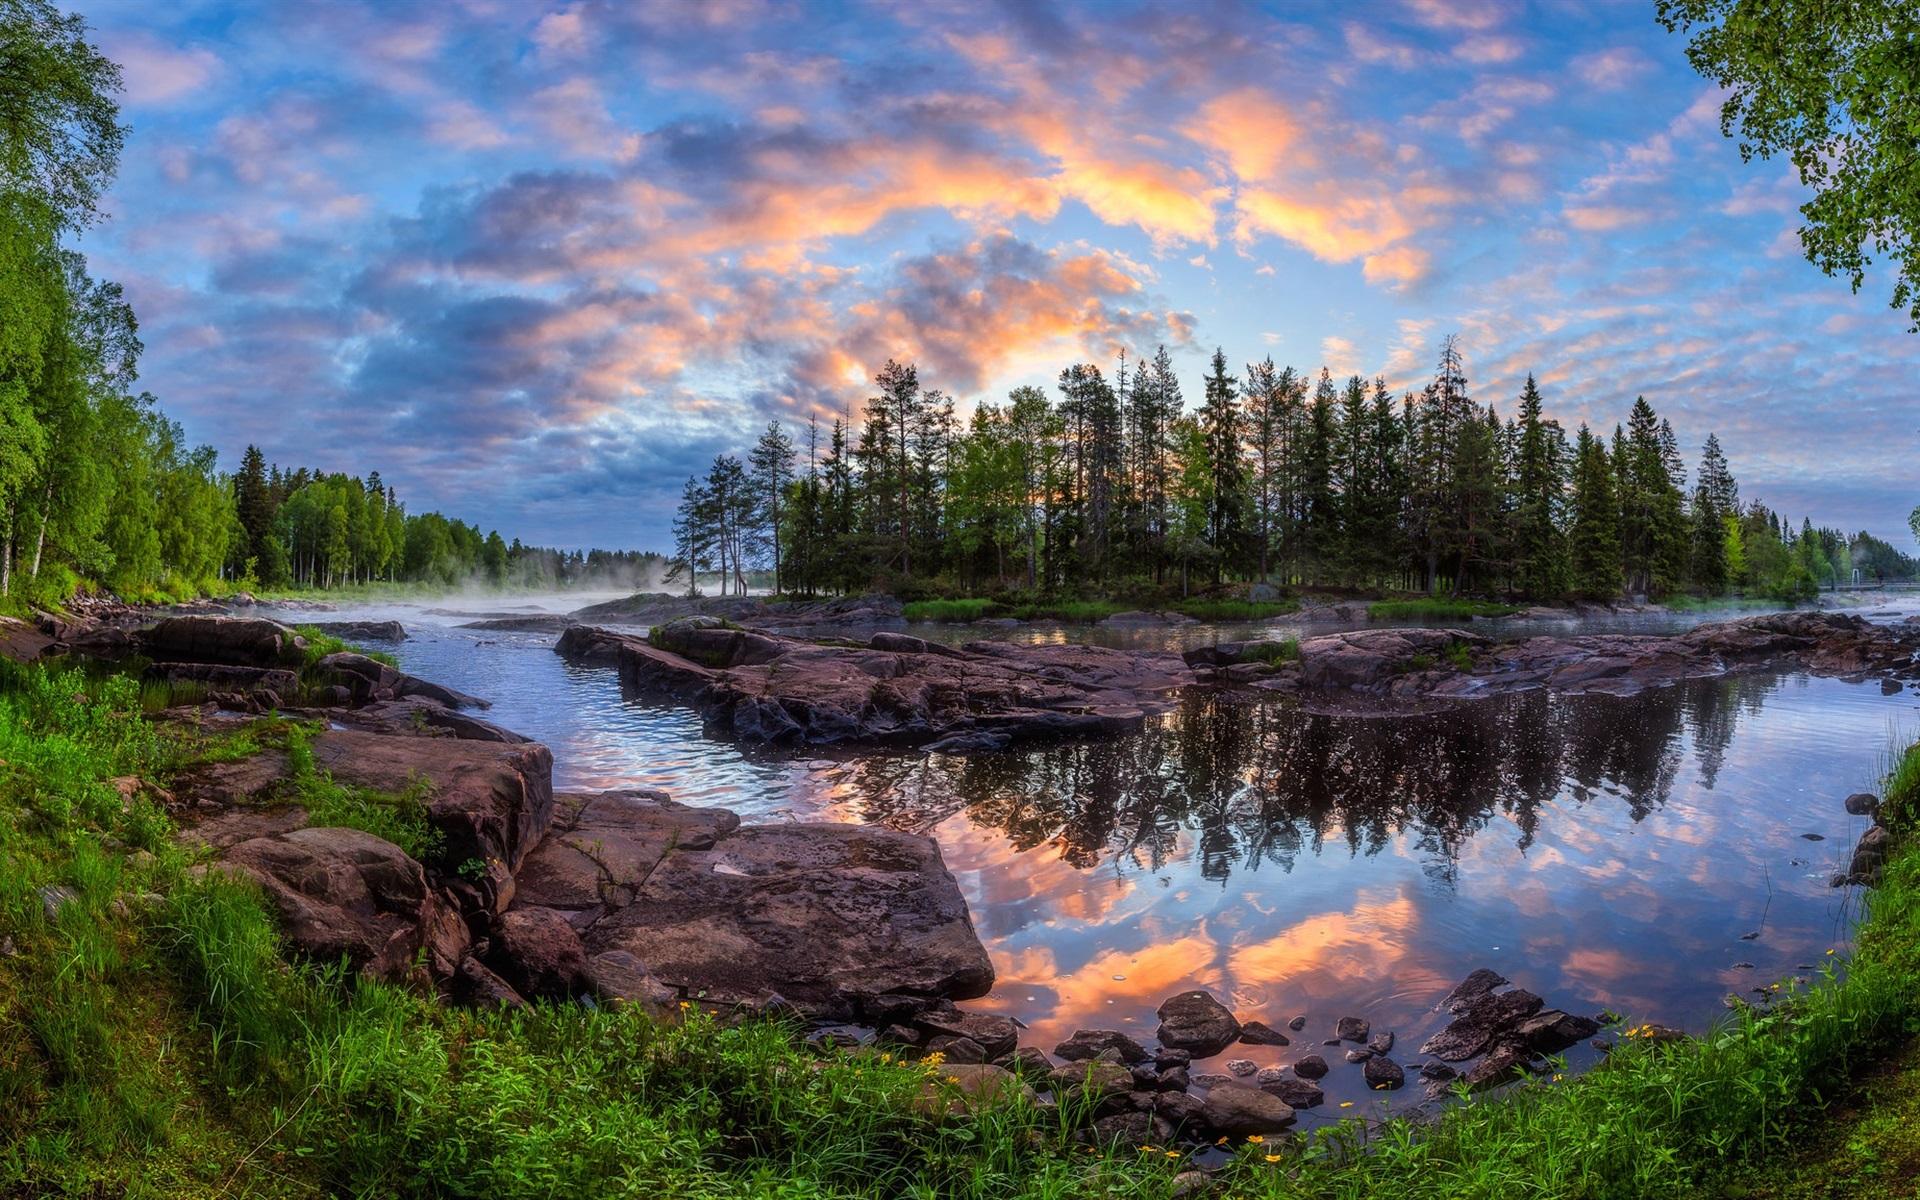 finland beautiful nature landscape river wallpaper kiiminki trees forest wallpapers hd backgrounds wallpaperaccess